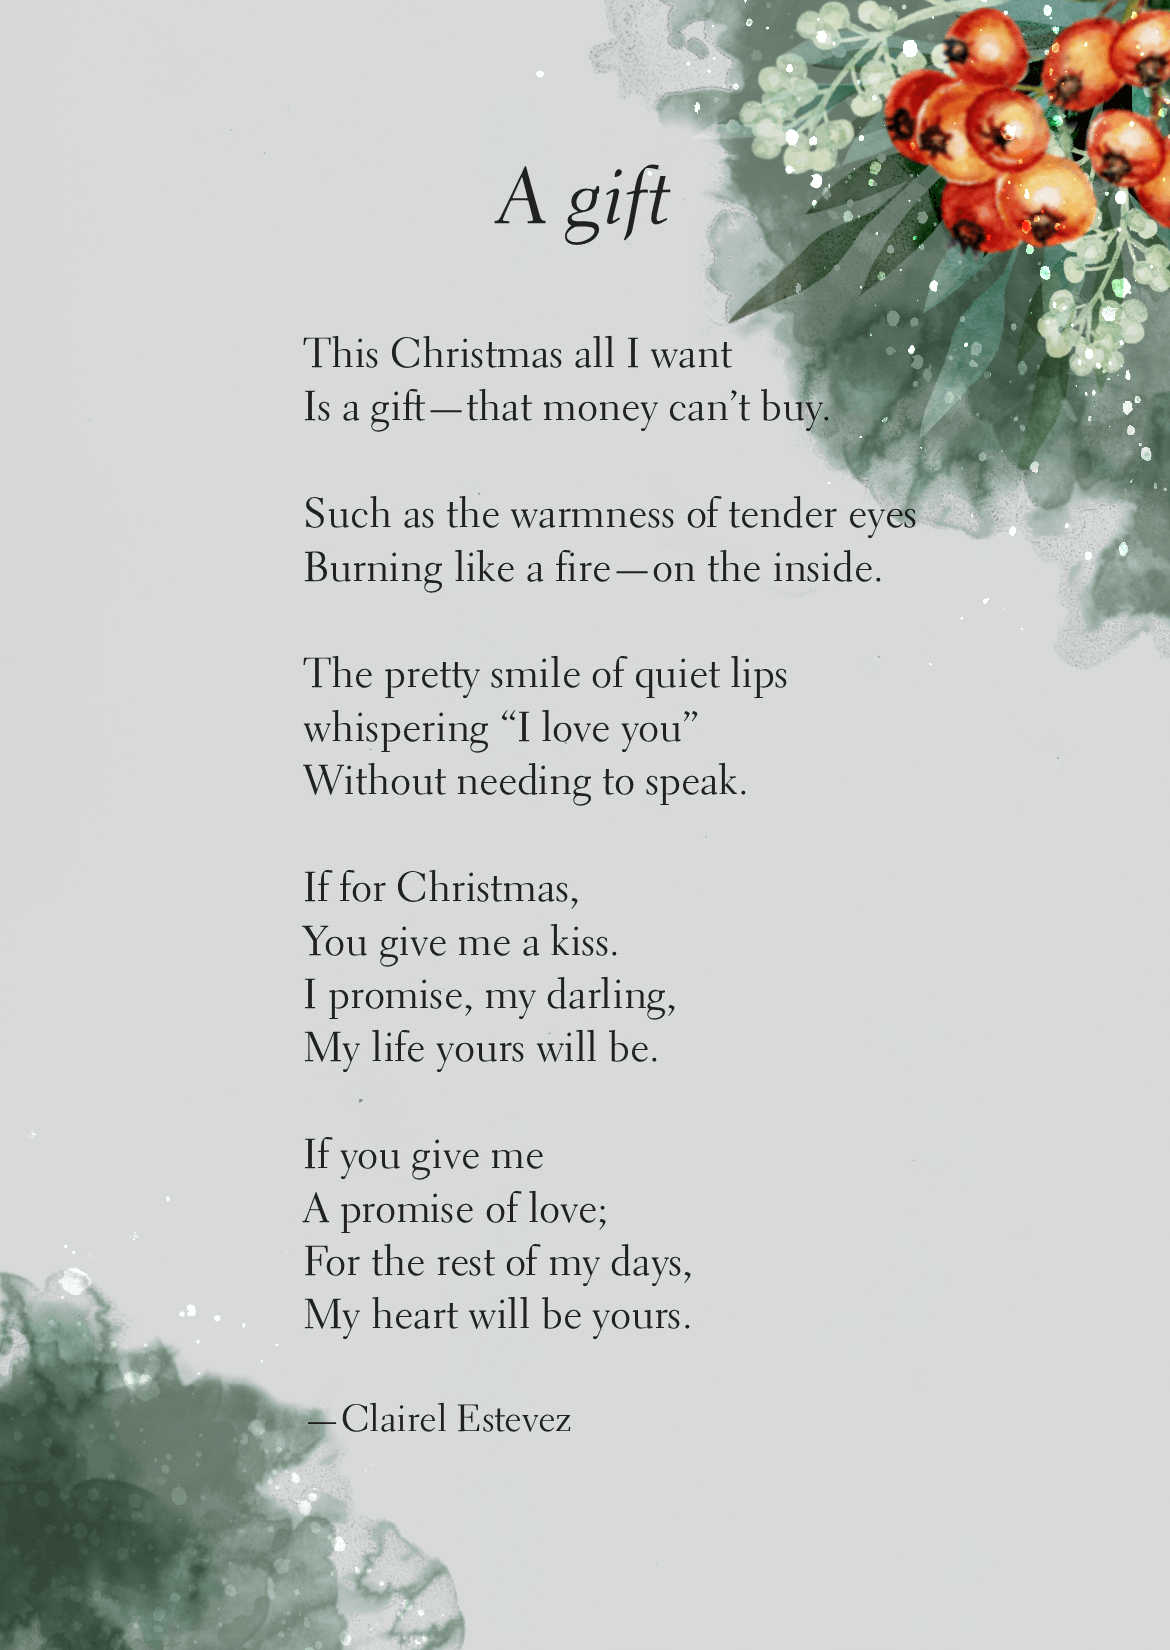 A Gift Christmas love poem Love poems, Poems, Christmas